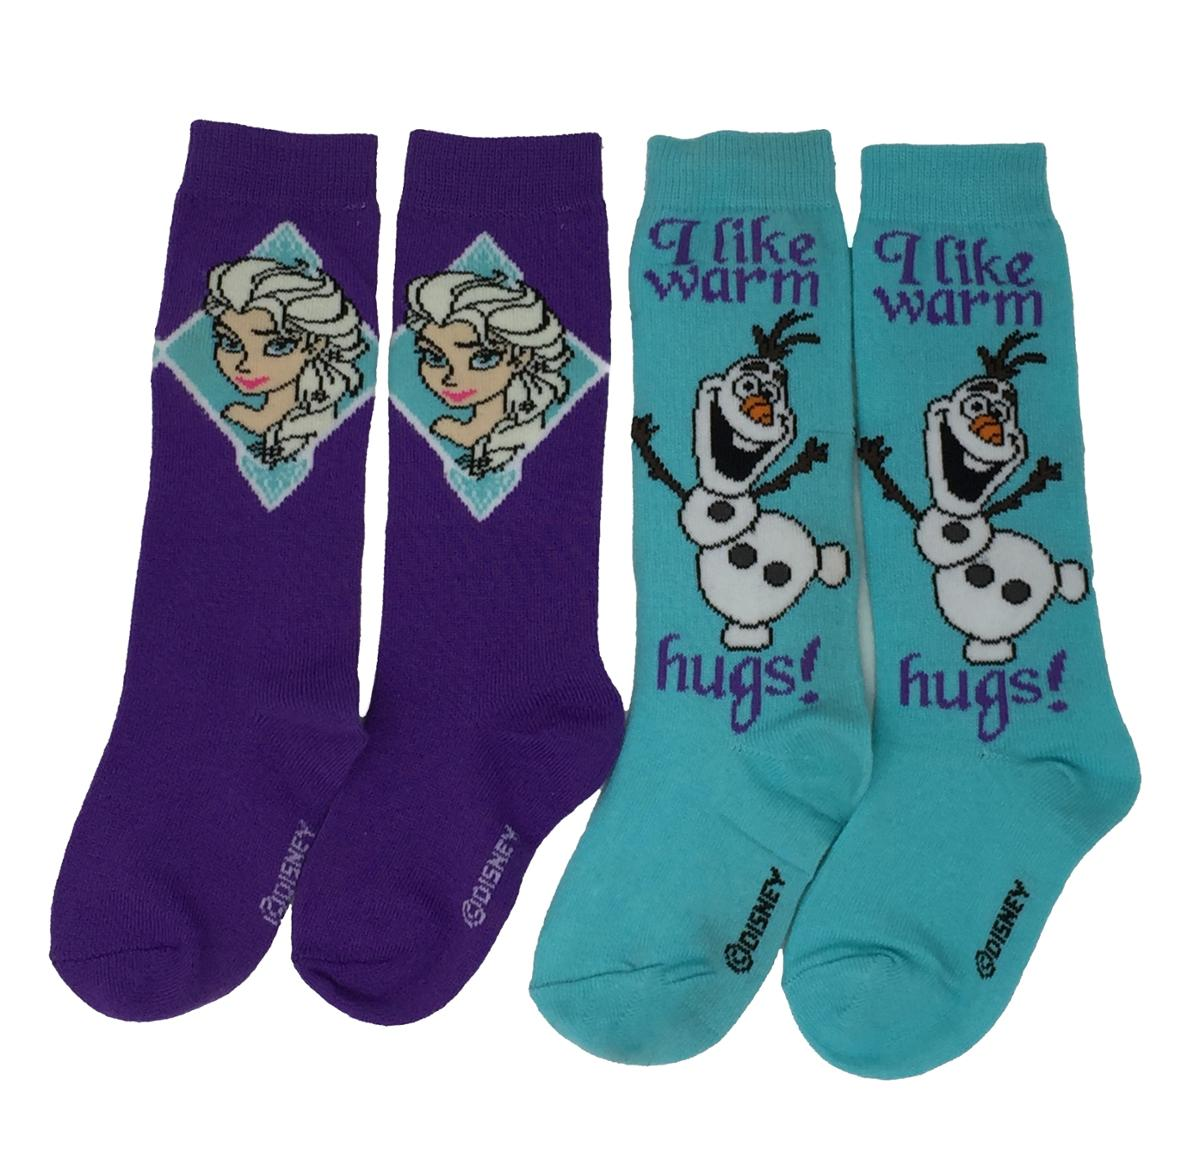 Frozen Knee High Socks 2 Pairs